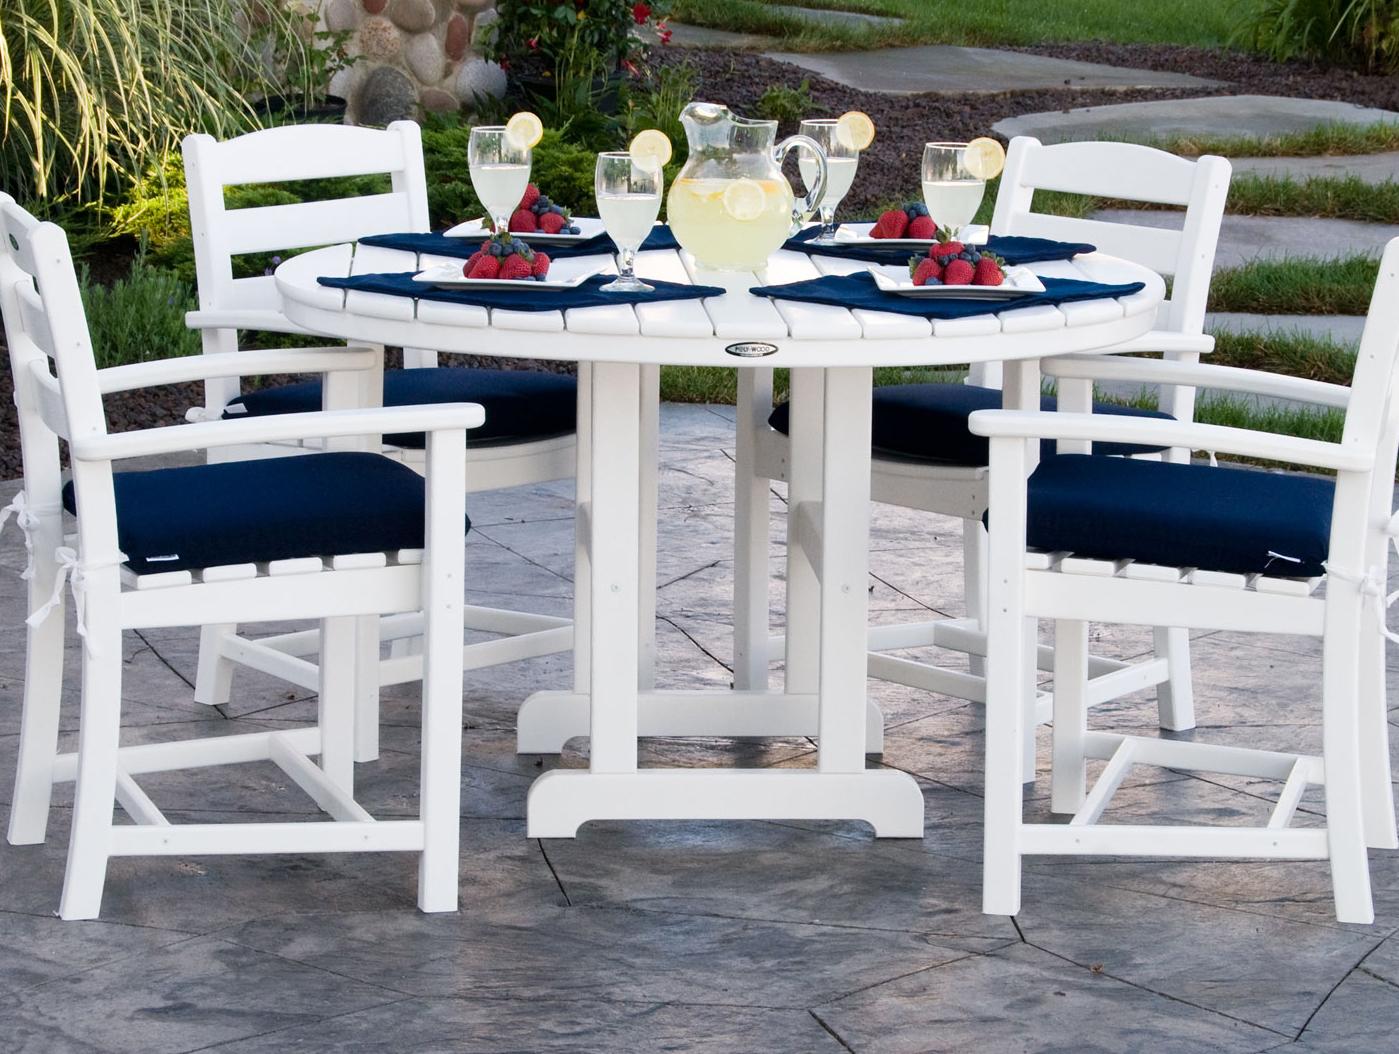 Choose La Casa Cafe Dining Set Cushions Product Photo